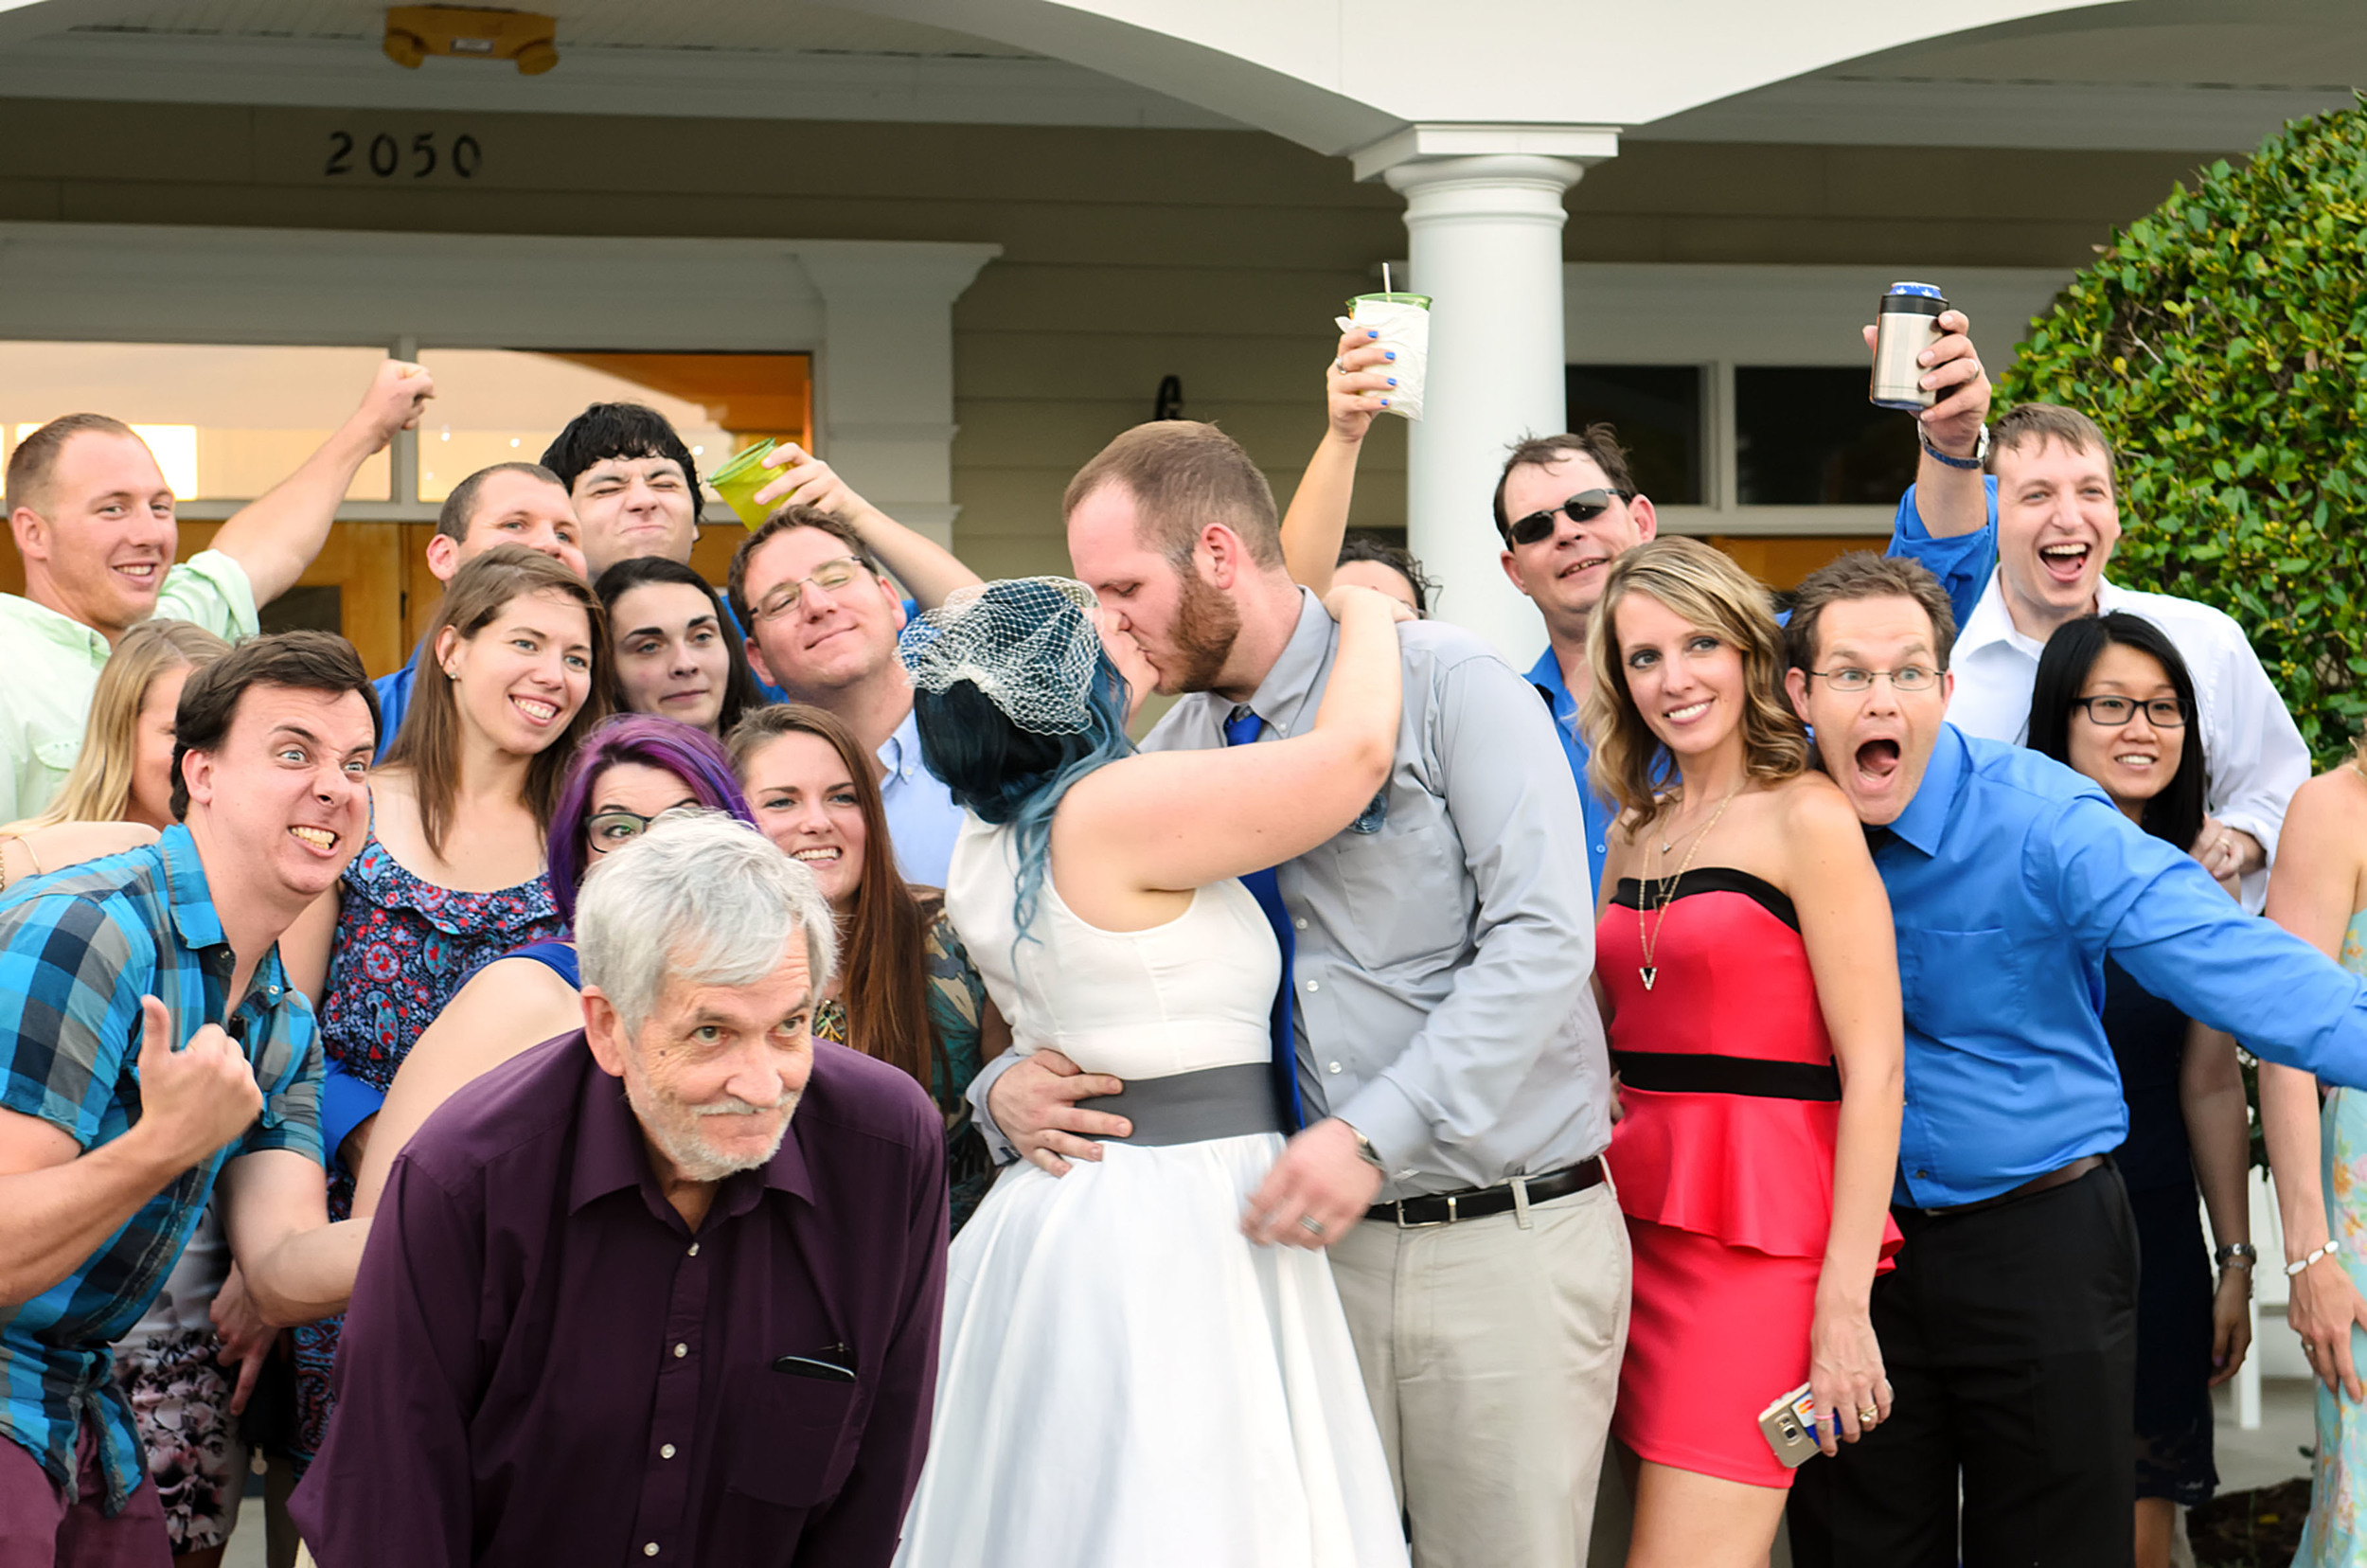 Leland_Wedding_Photographer_Tiffany_Abruzzo_Reception_140.jpg